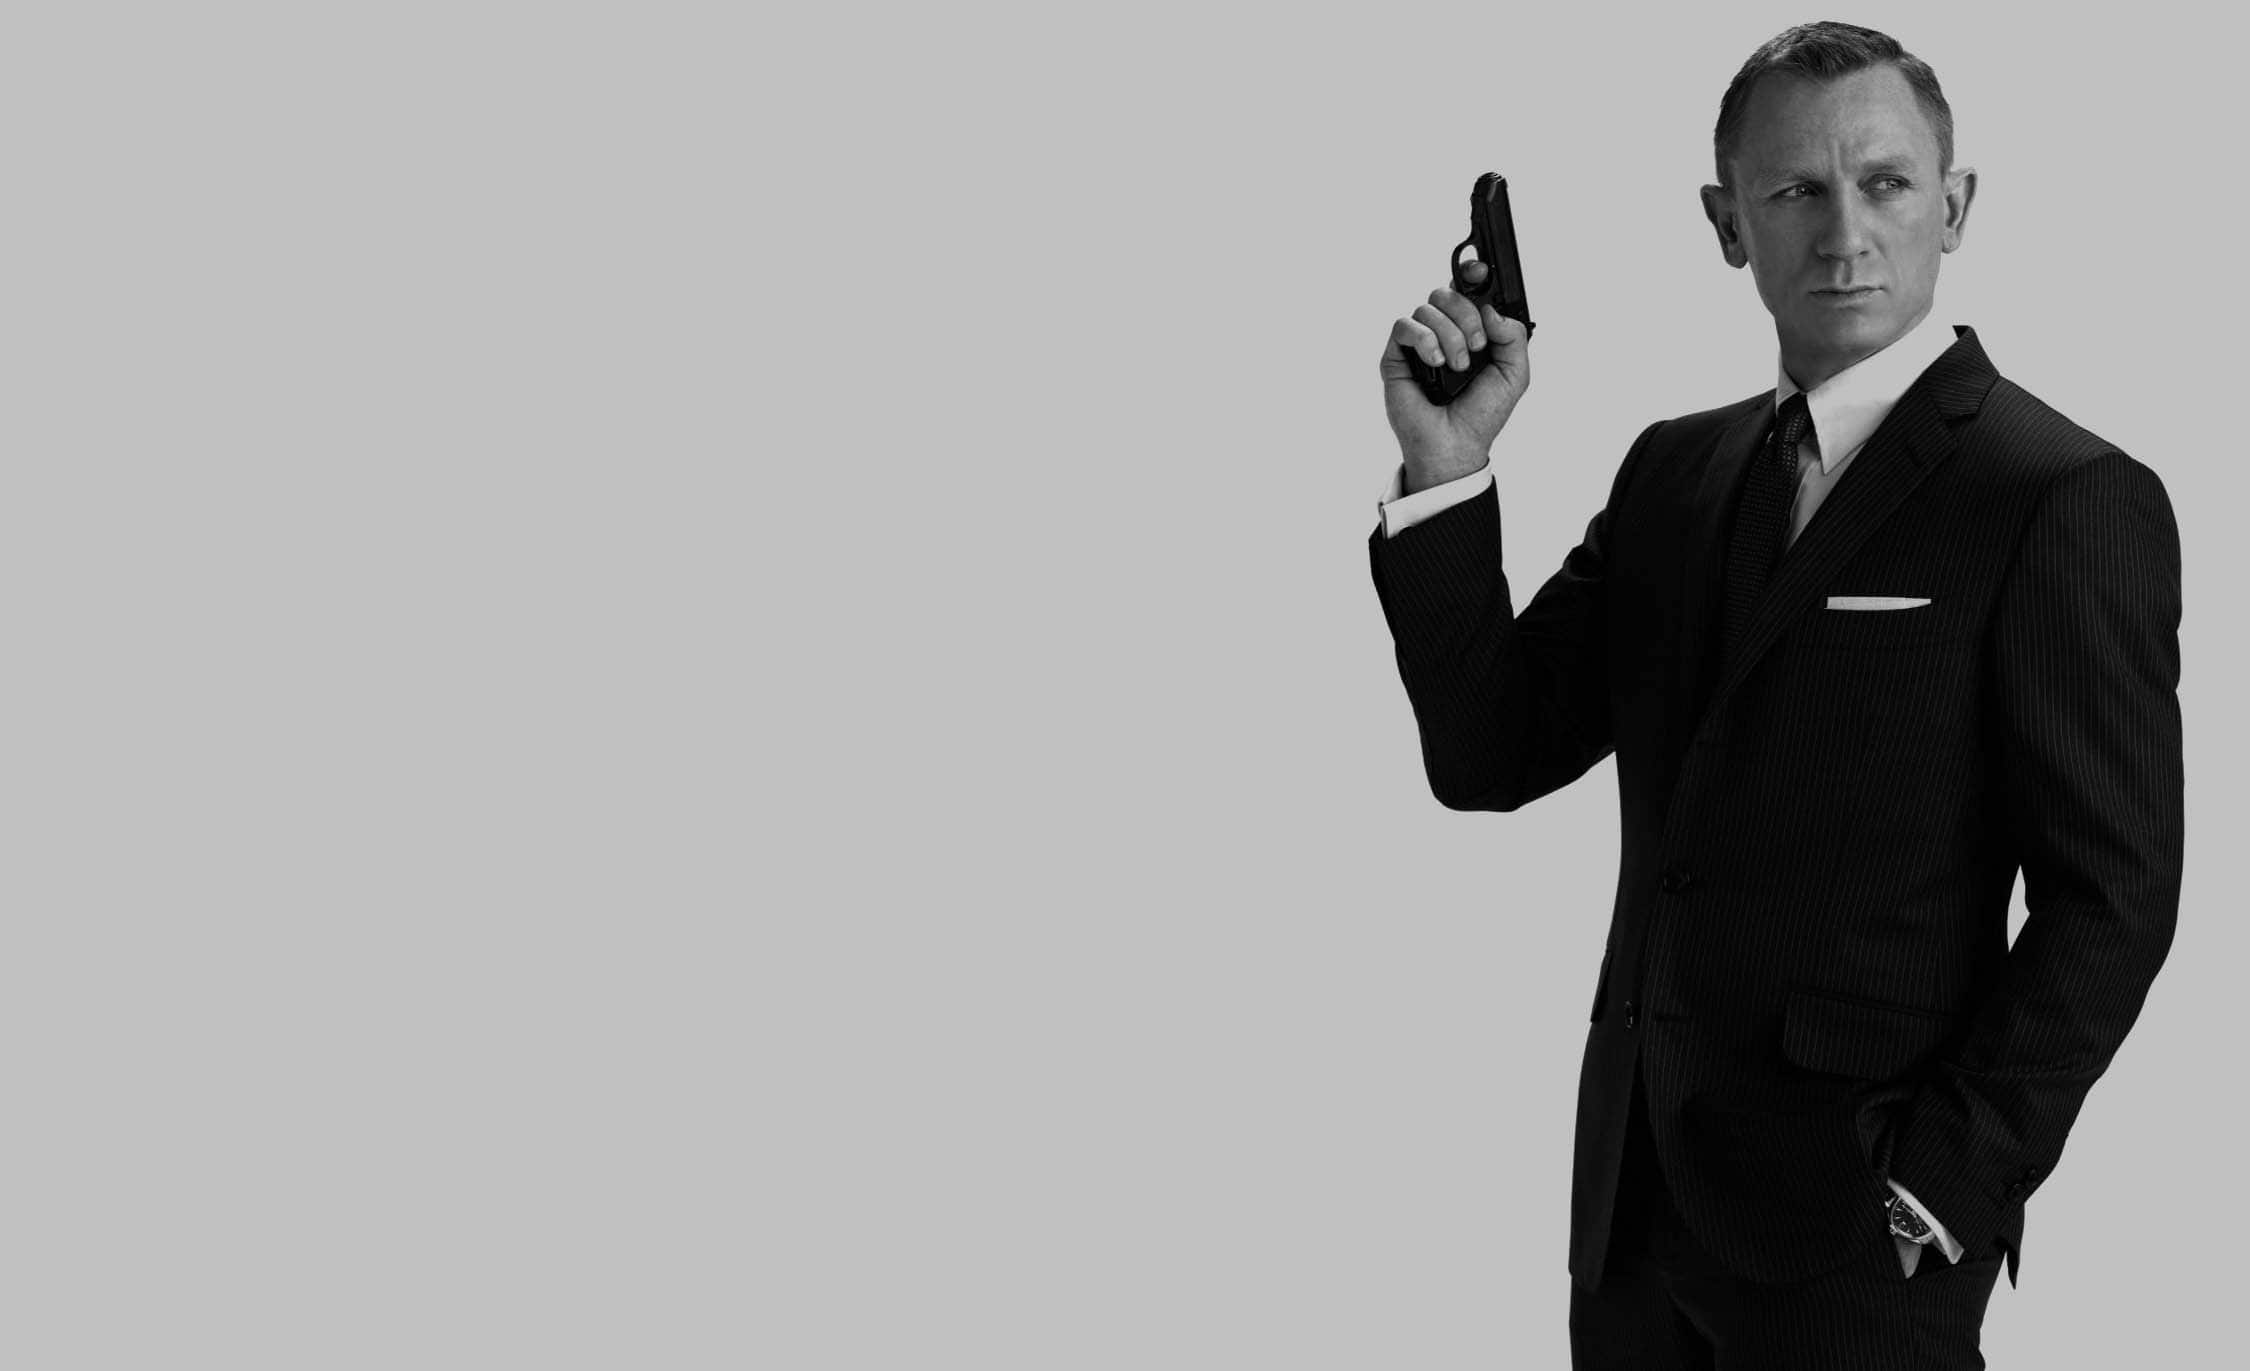 25th Instalment Of James Bond Film To Be Shot In Crotia